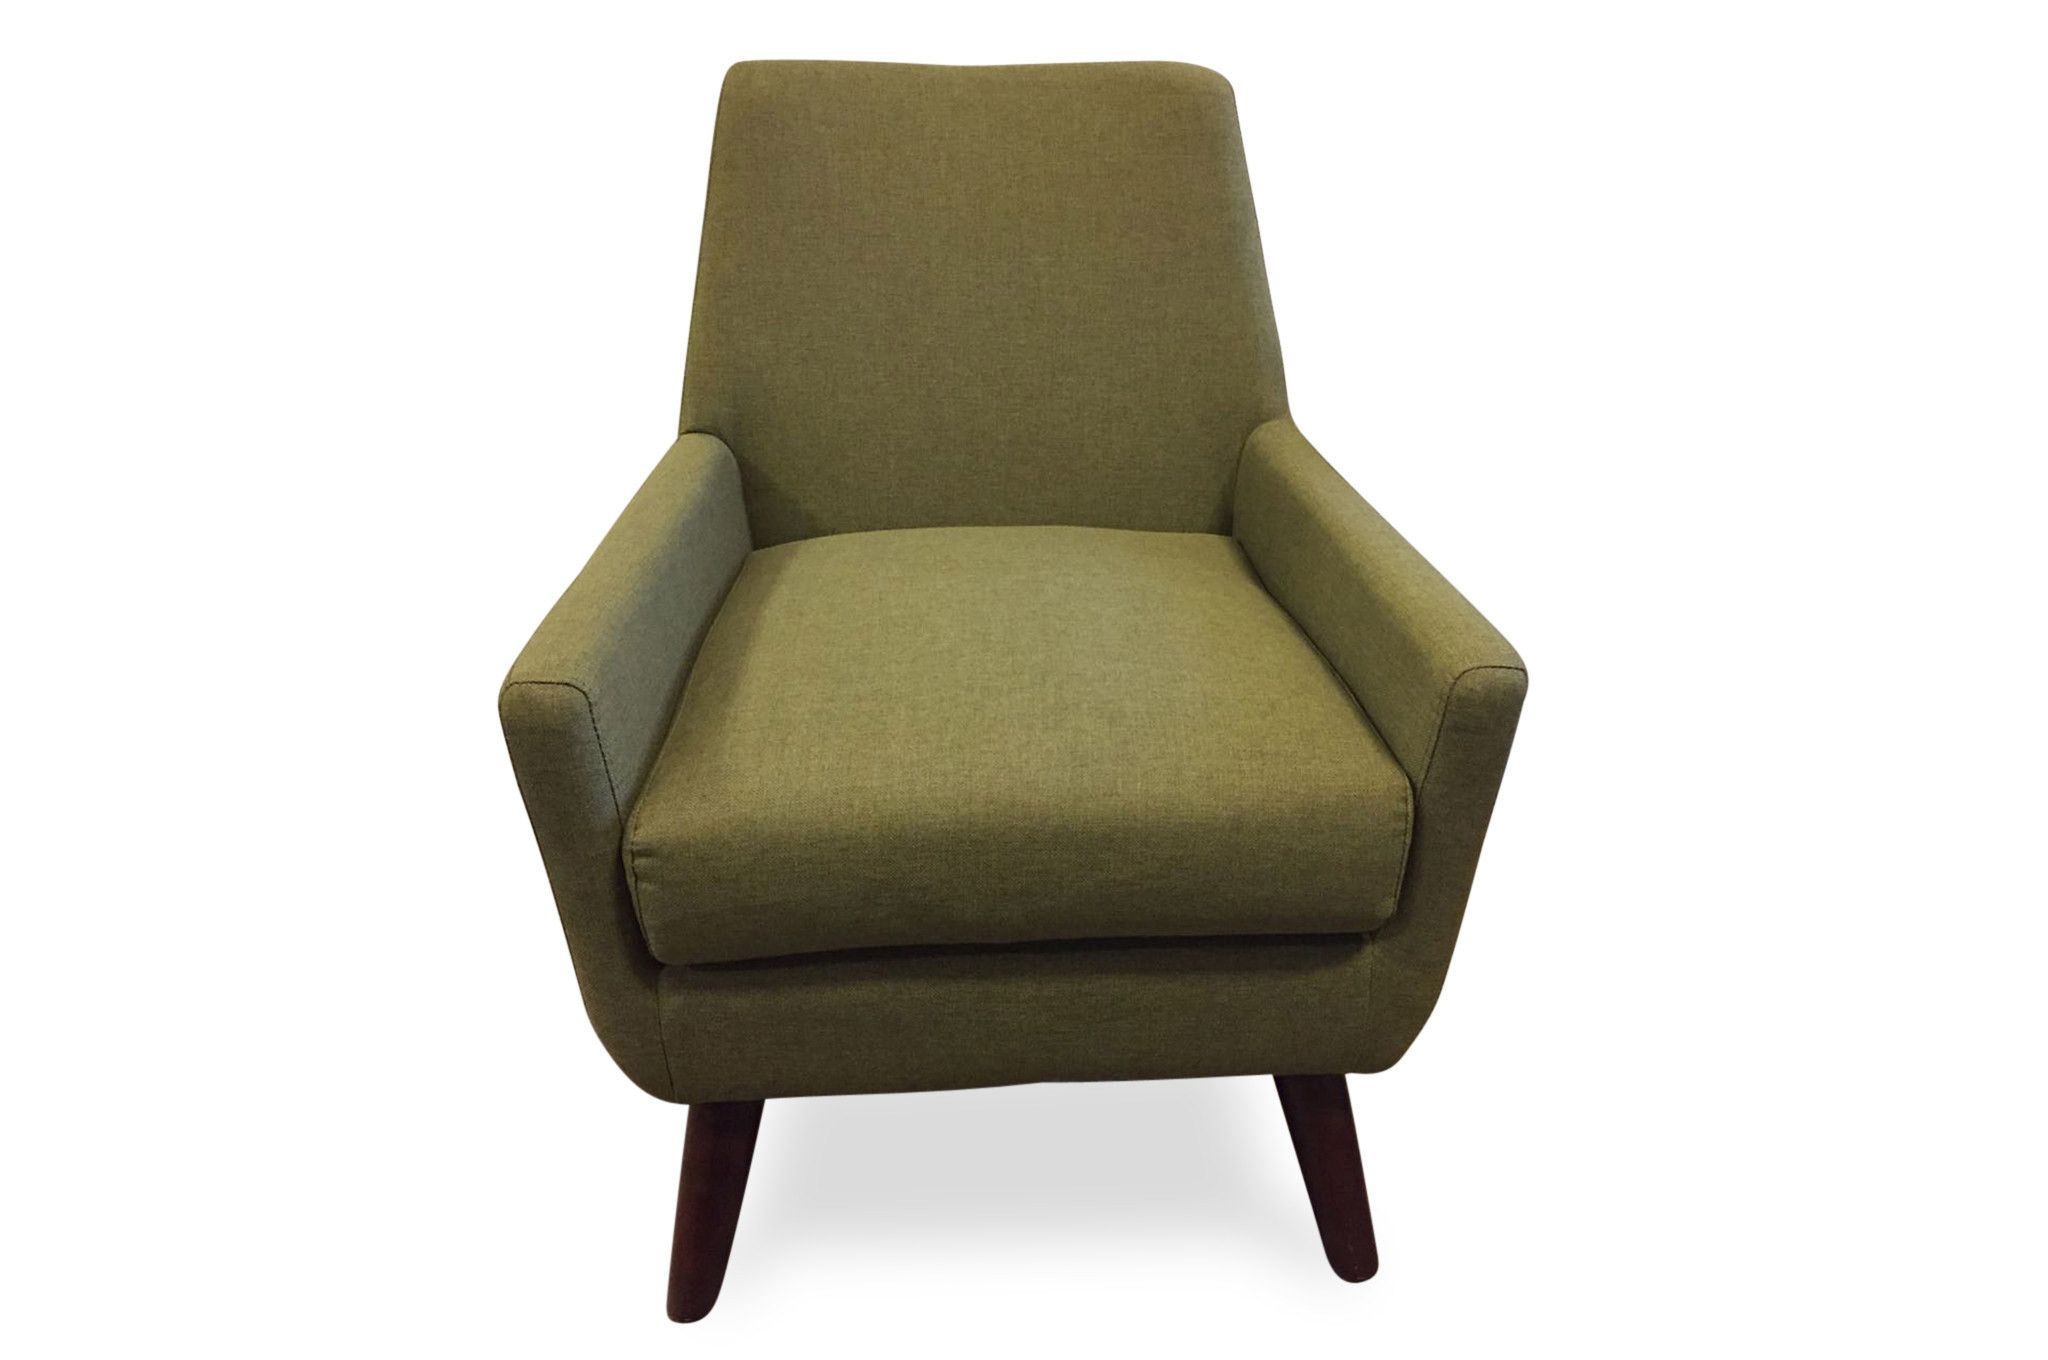 Beau Nova Lounge Chair + Mid Century Modern Lounge Chairs + Houston Furniture U003d  MidInMod U2013 MidinMod